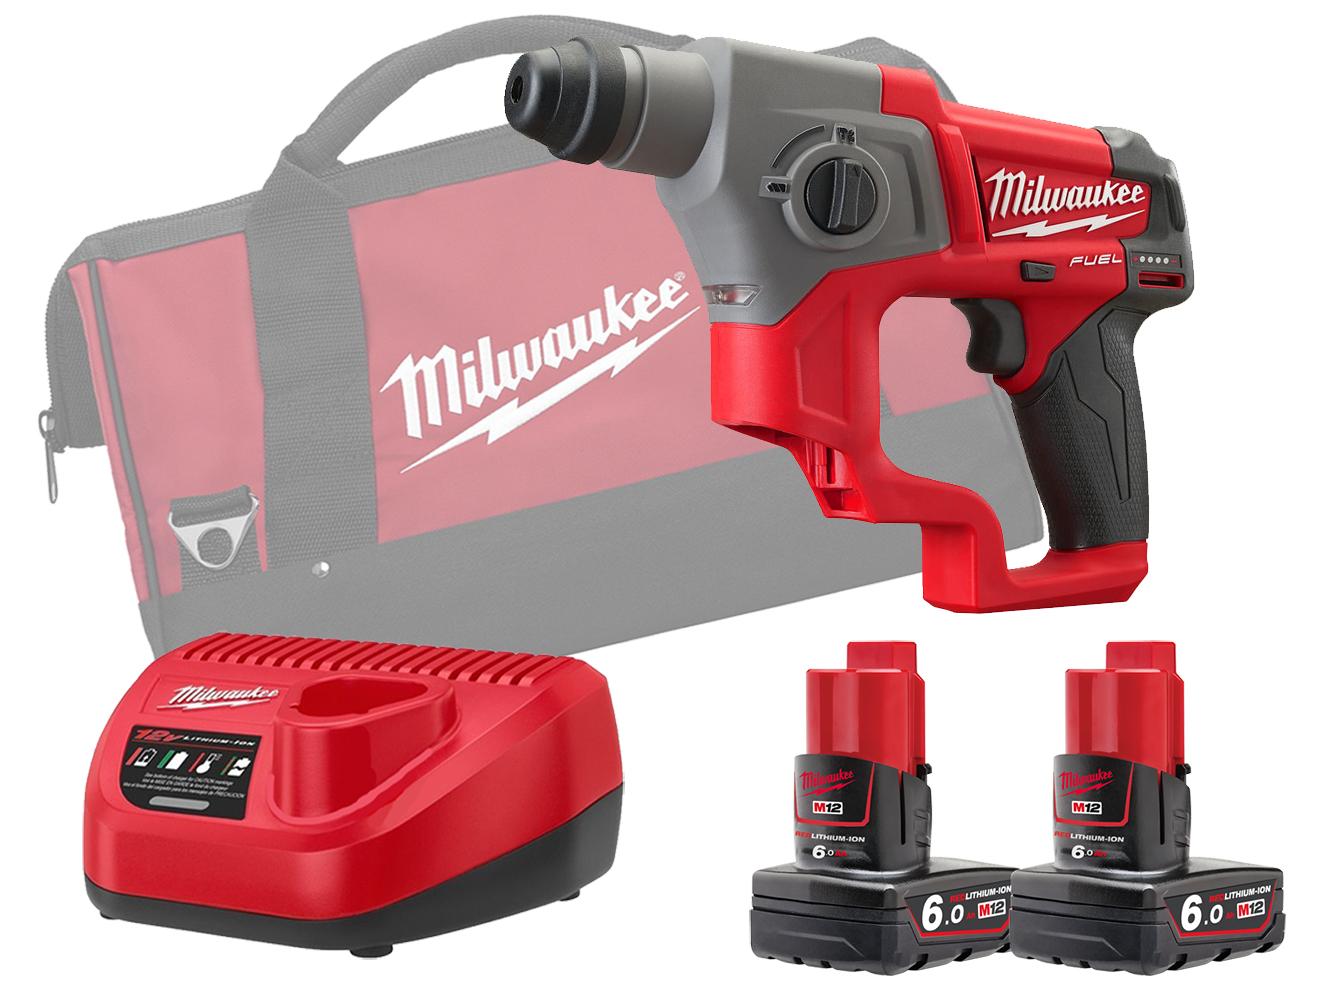 Milwaukee M12CH 12V Fuel SDS Plus 2 Mode Hammer - 6.0Ah Pack